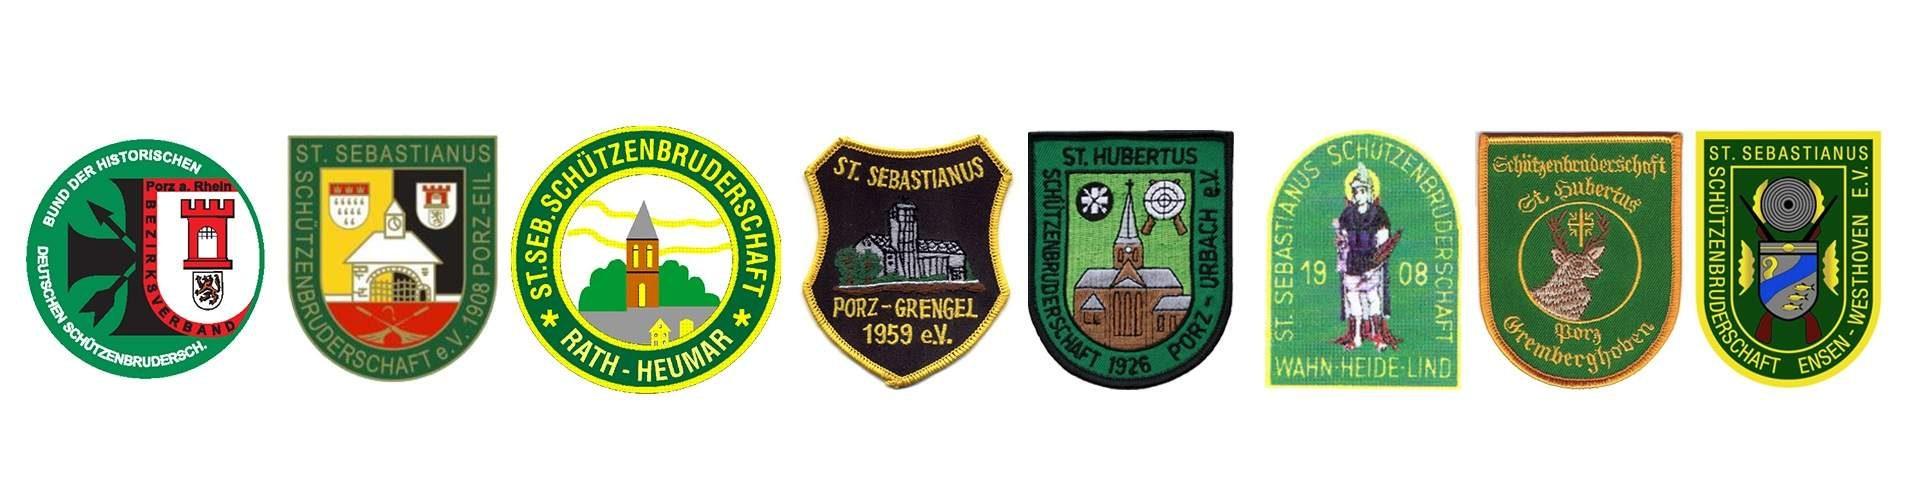 Bezirksverband Porz